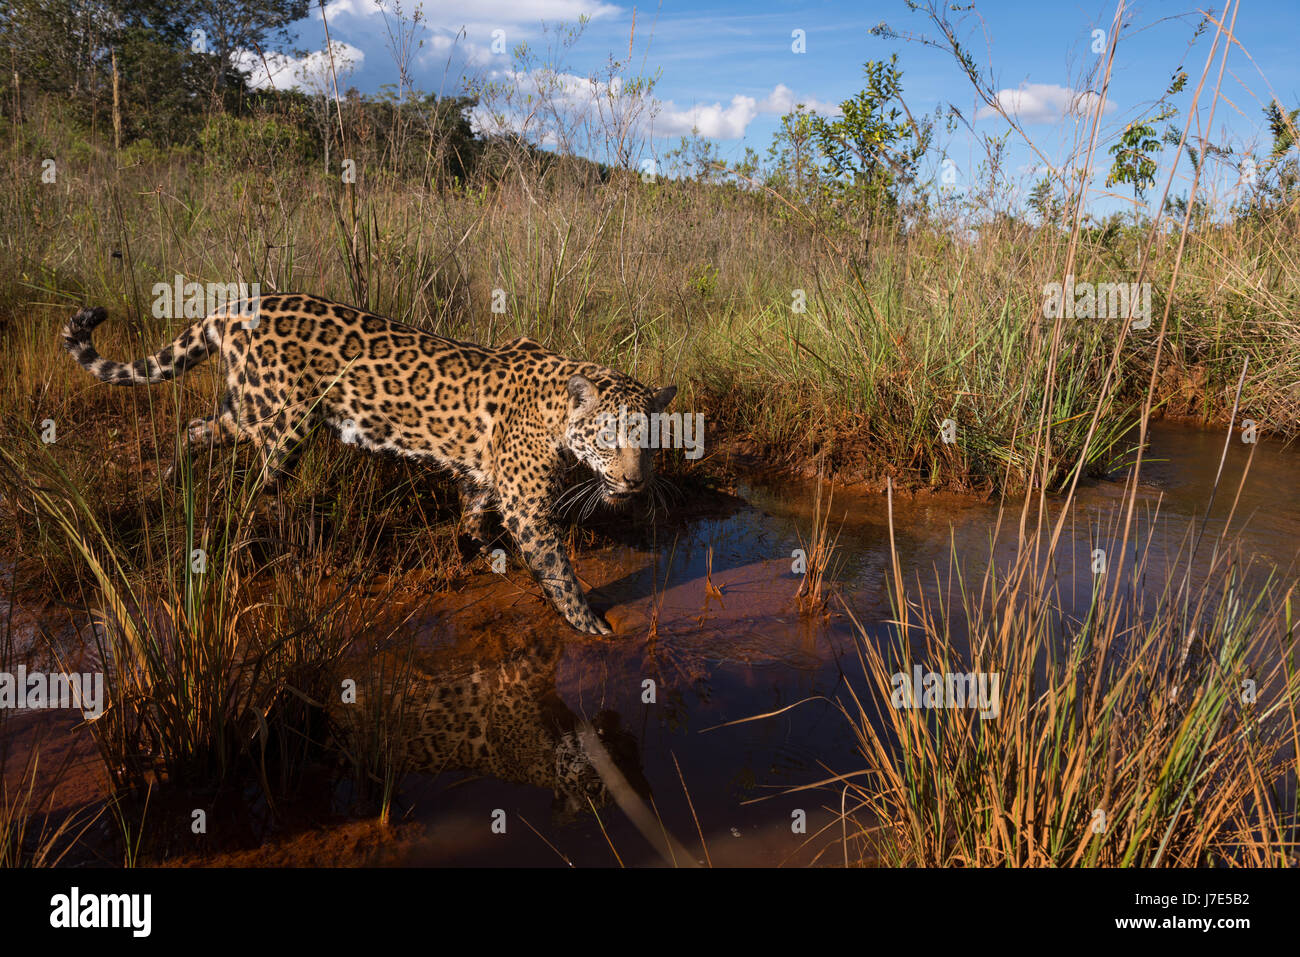 A Jaguar explores a water creek in the Brazilian Cerrado Stock Photo